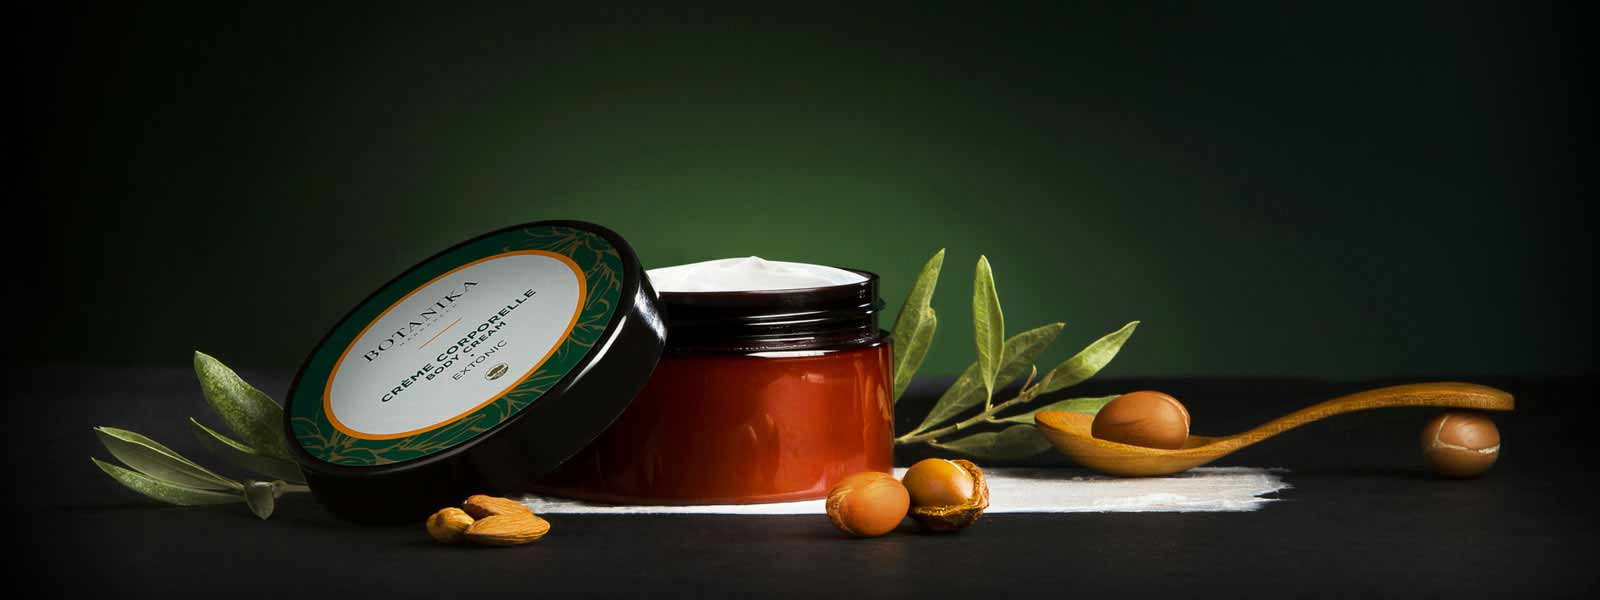 Moroccan Prestige Argan Oil